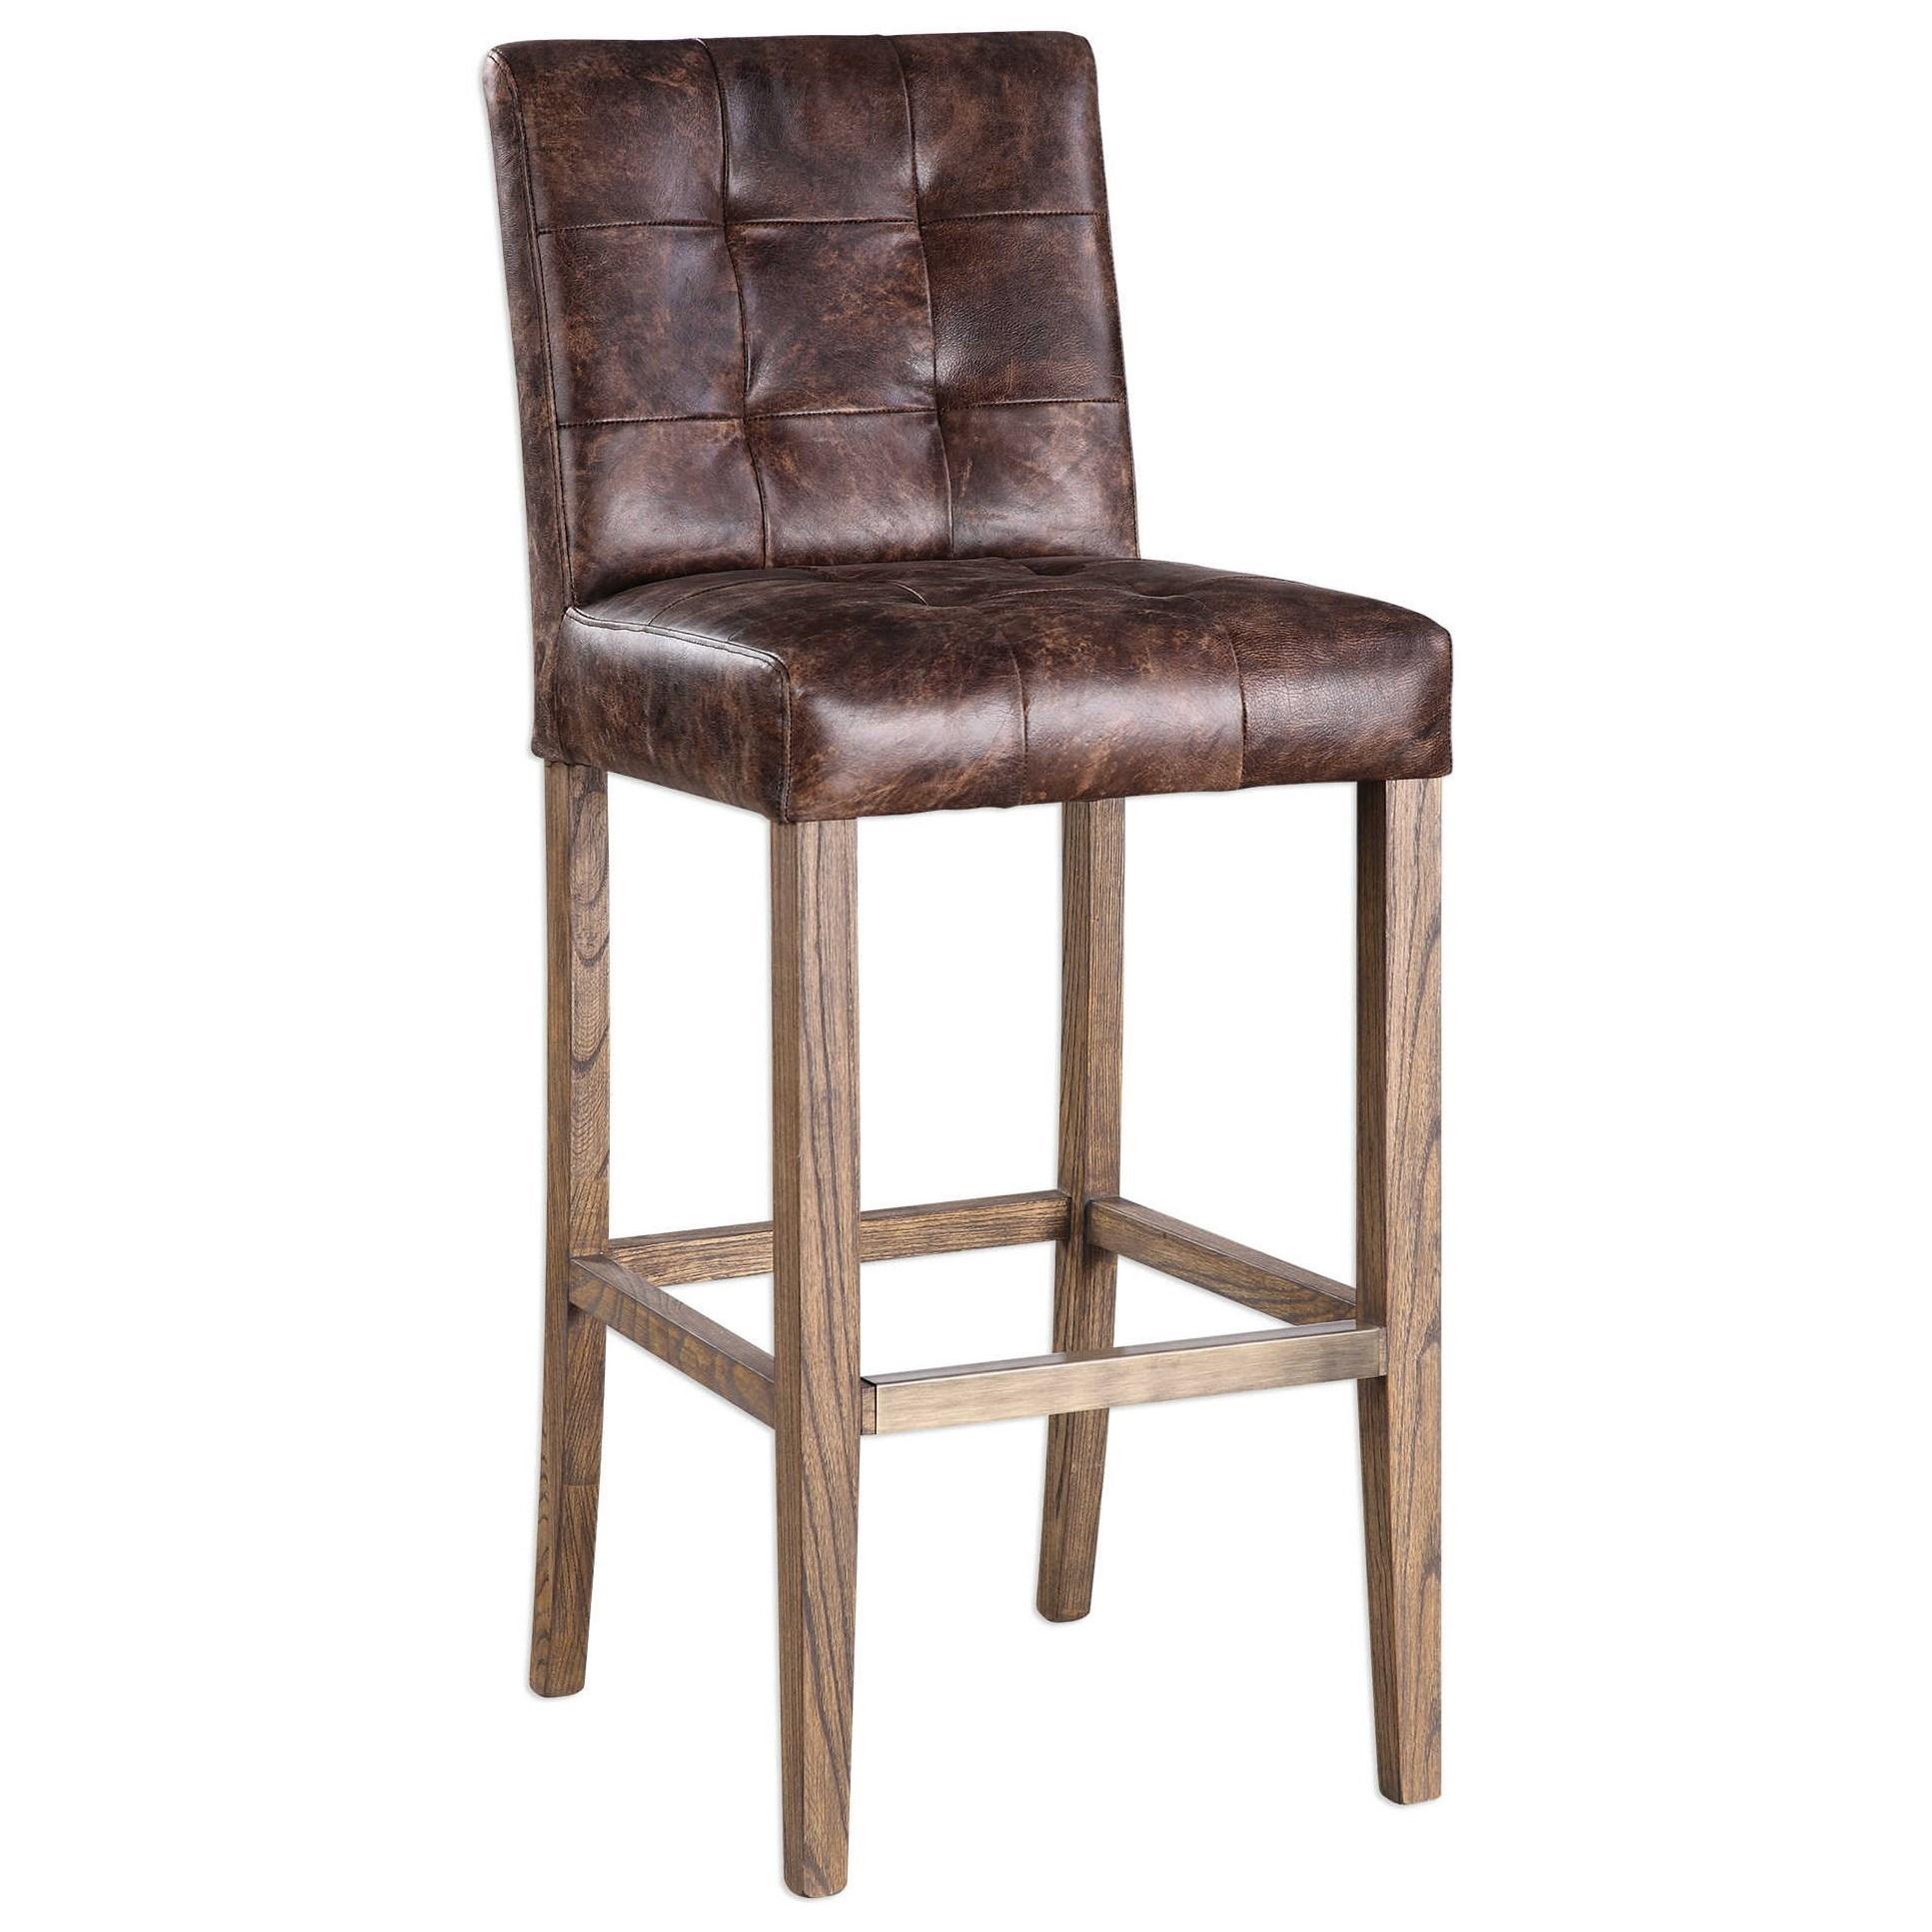 Uttermost Accent Furniture  Julian Tufted Bar Stool - Item Number: 23330